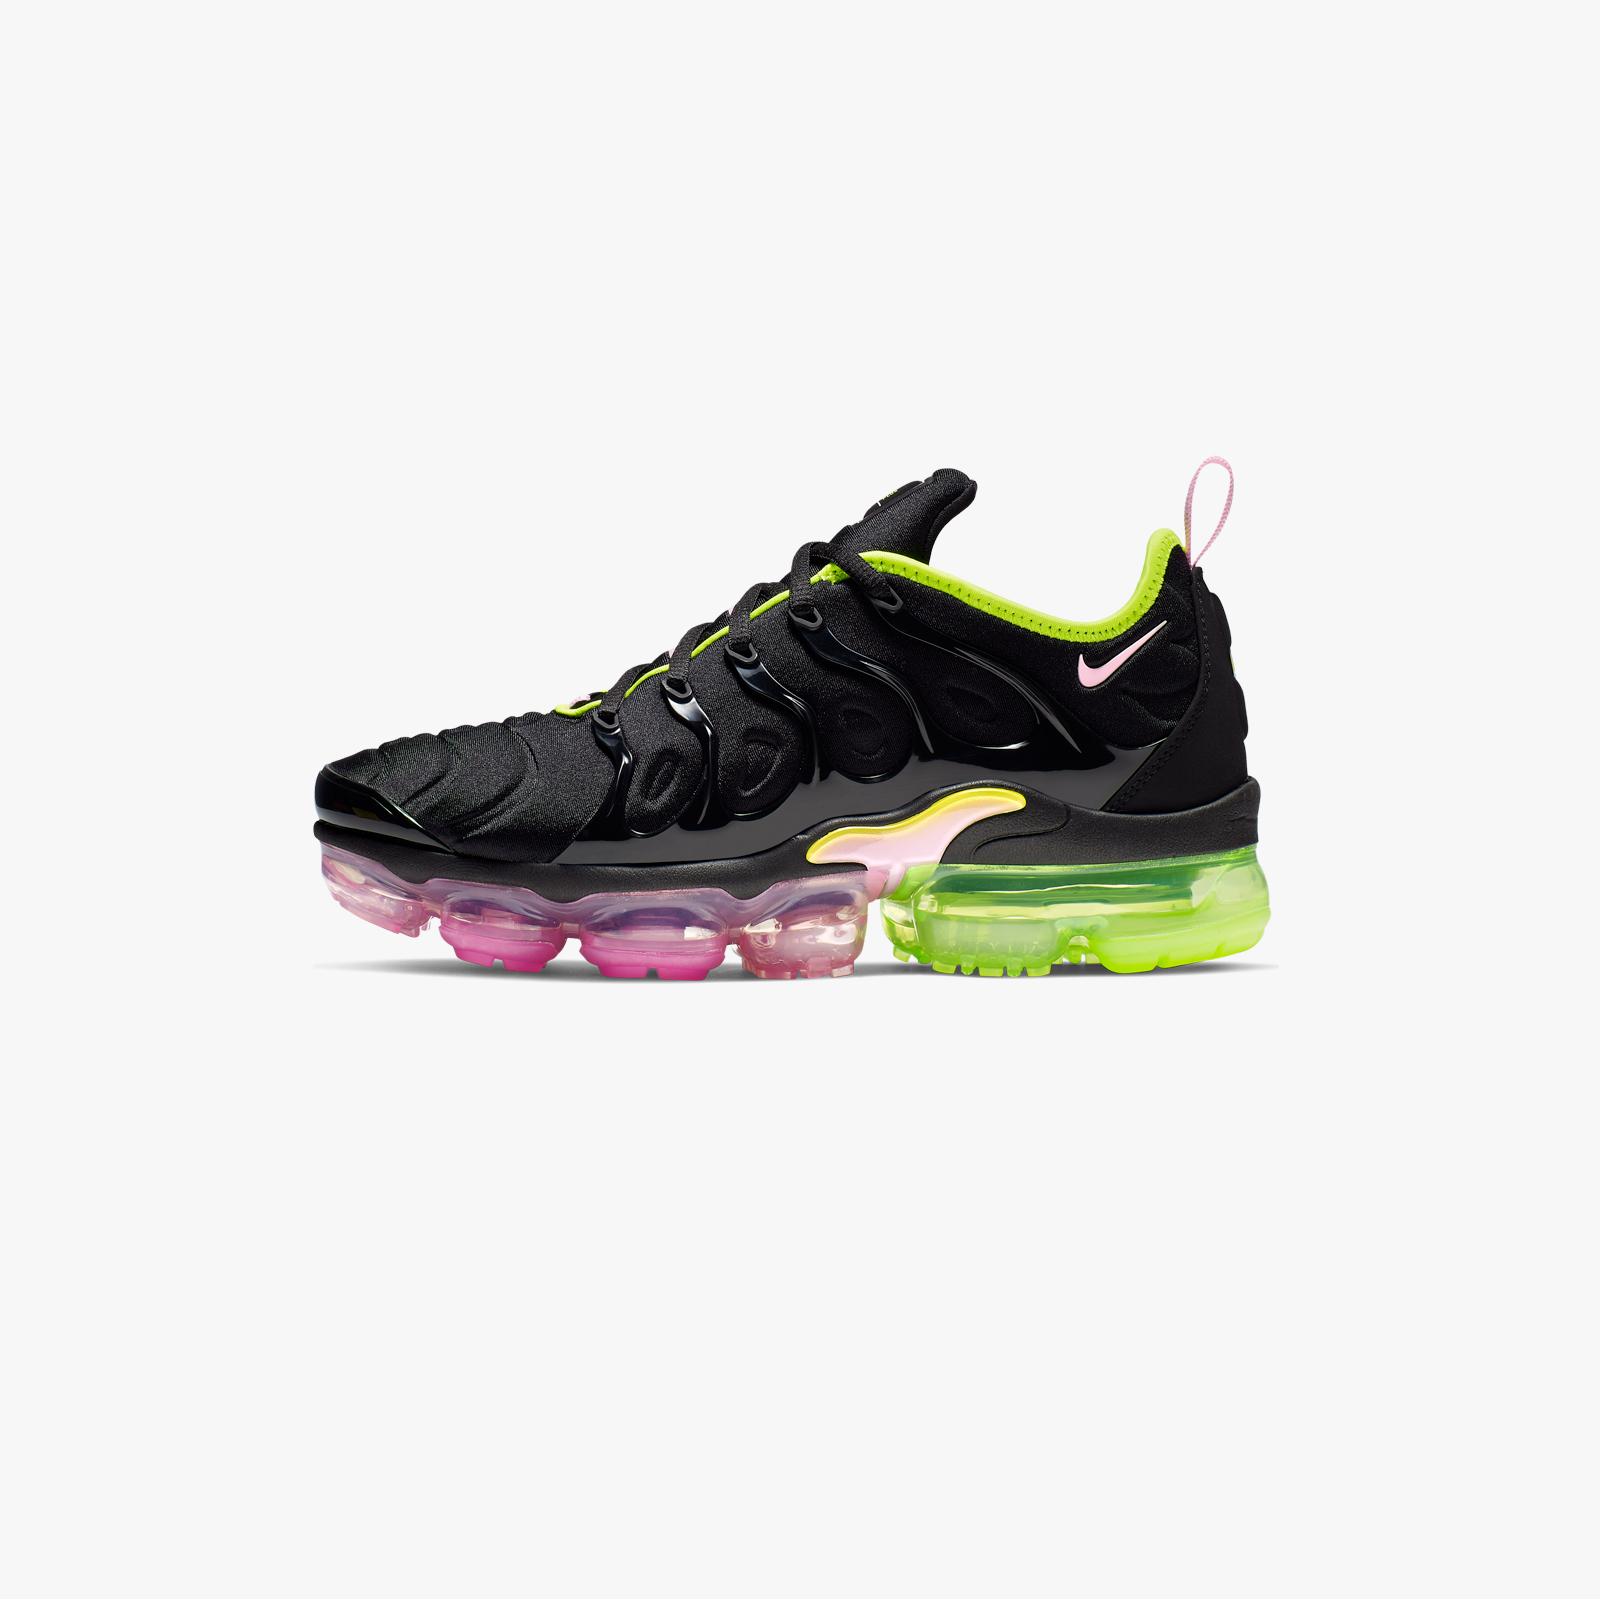 ec8c439d76 Nike Wmns Air Vapormax Plus - Ci6160-001 - Sneakersnstuff | sneakers &  streetwear online since 1999